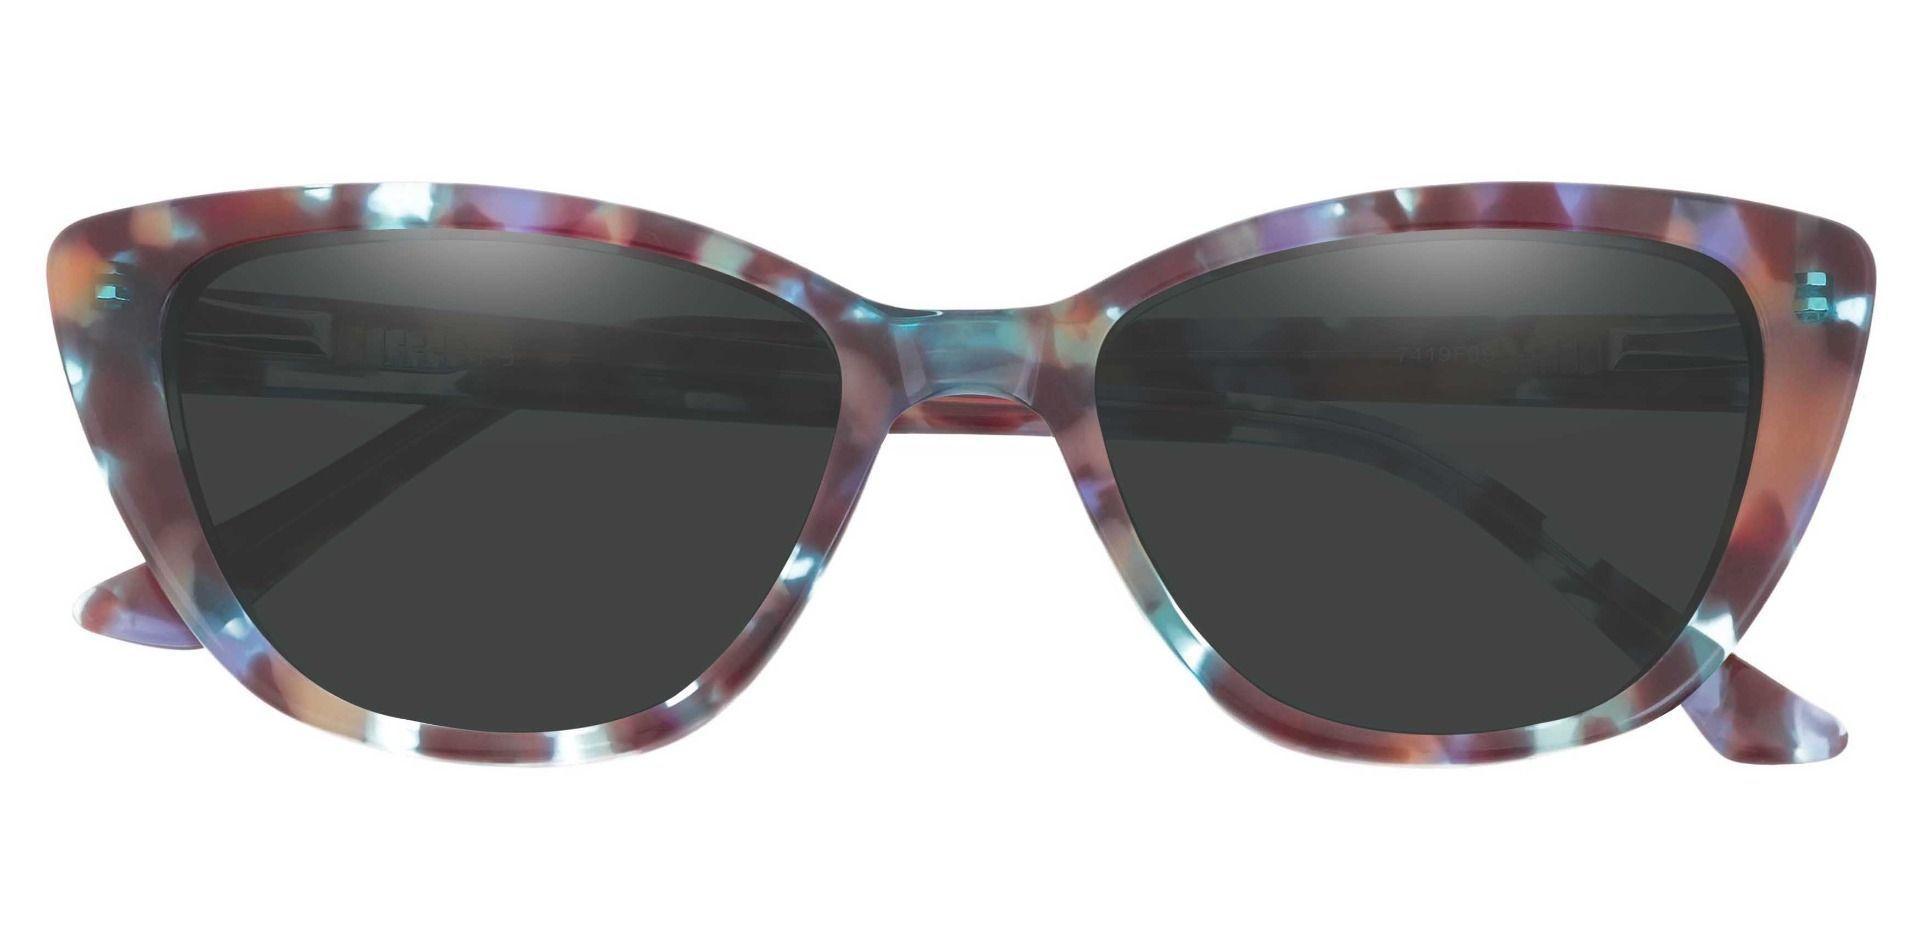 Athena Cat-Eye Floral Prescription Sunglasses